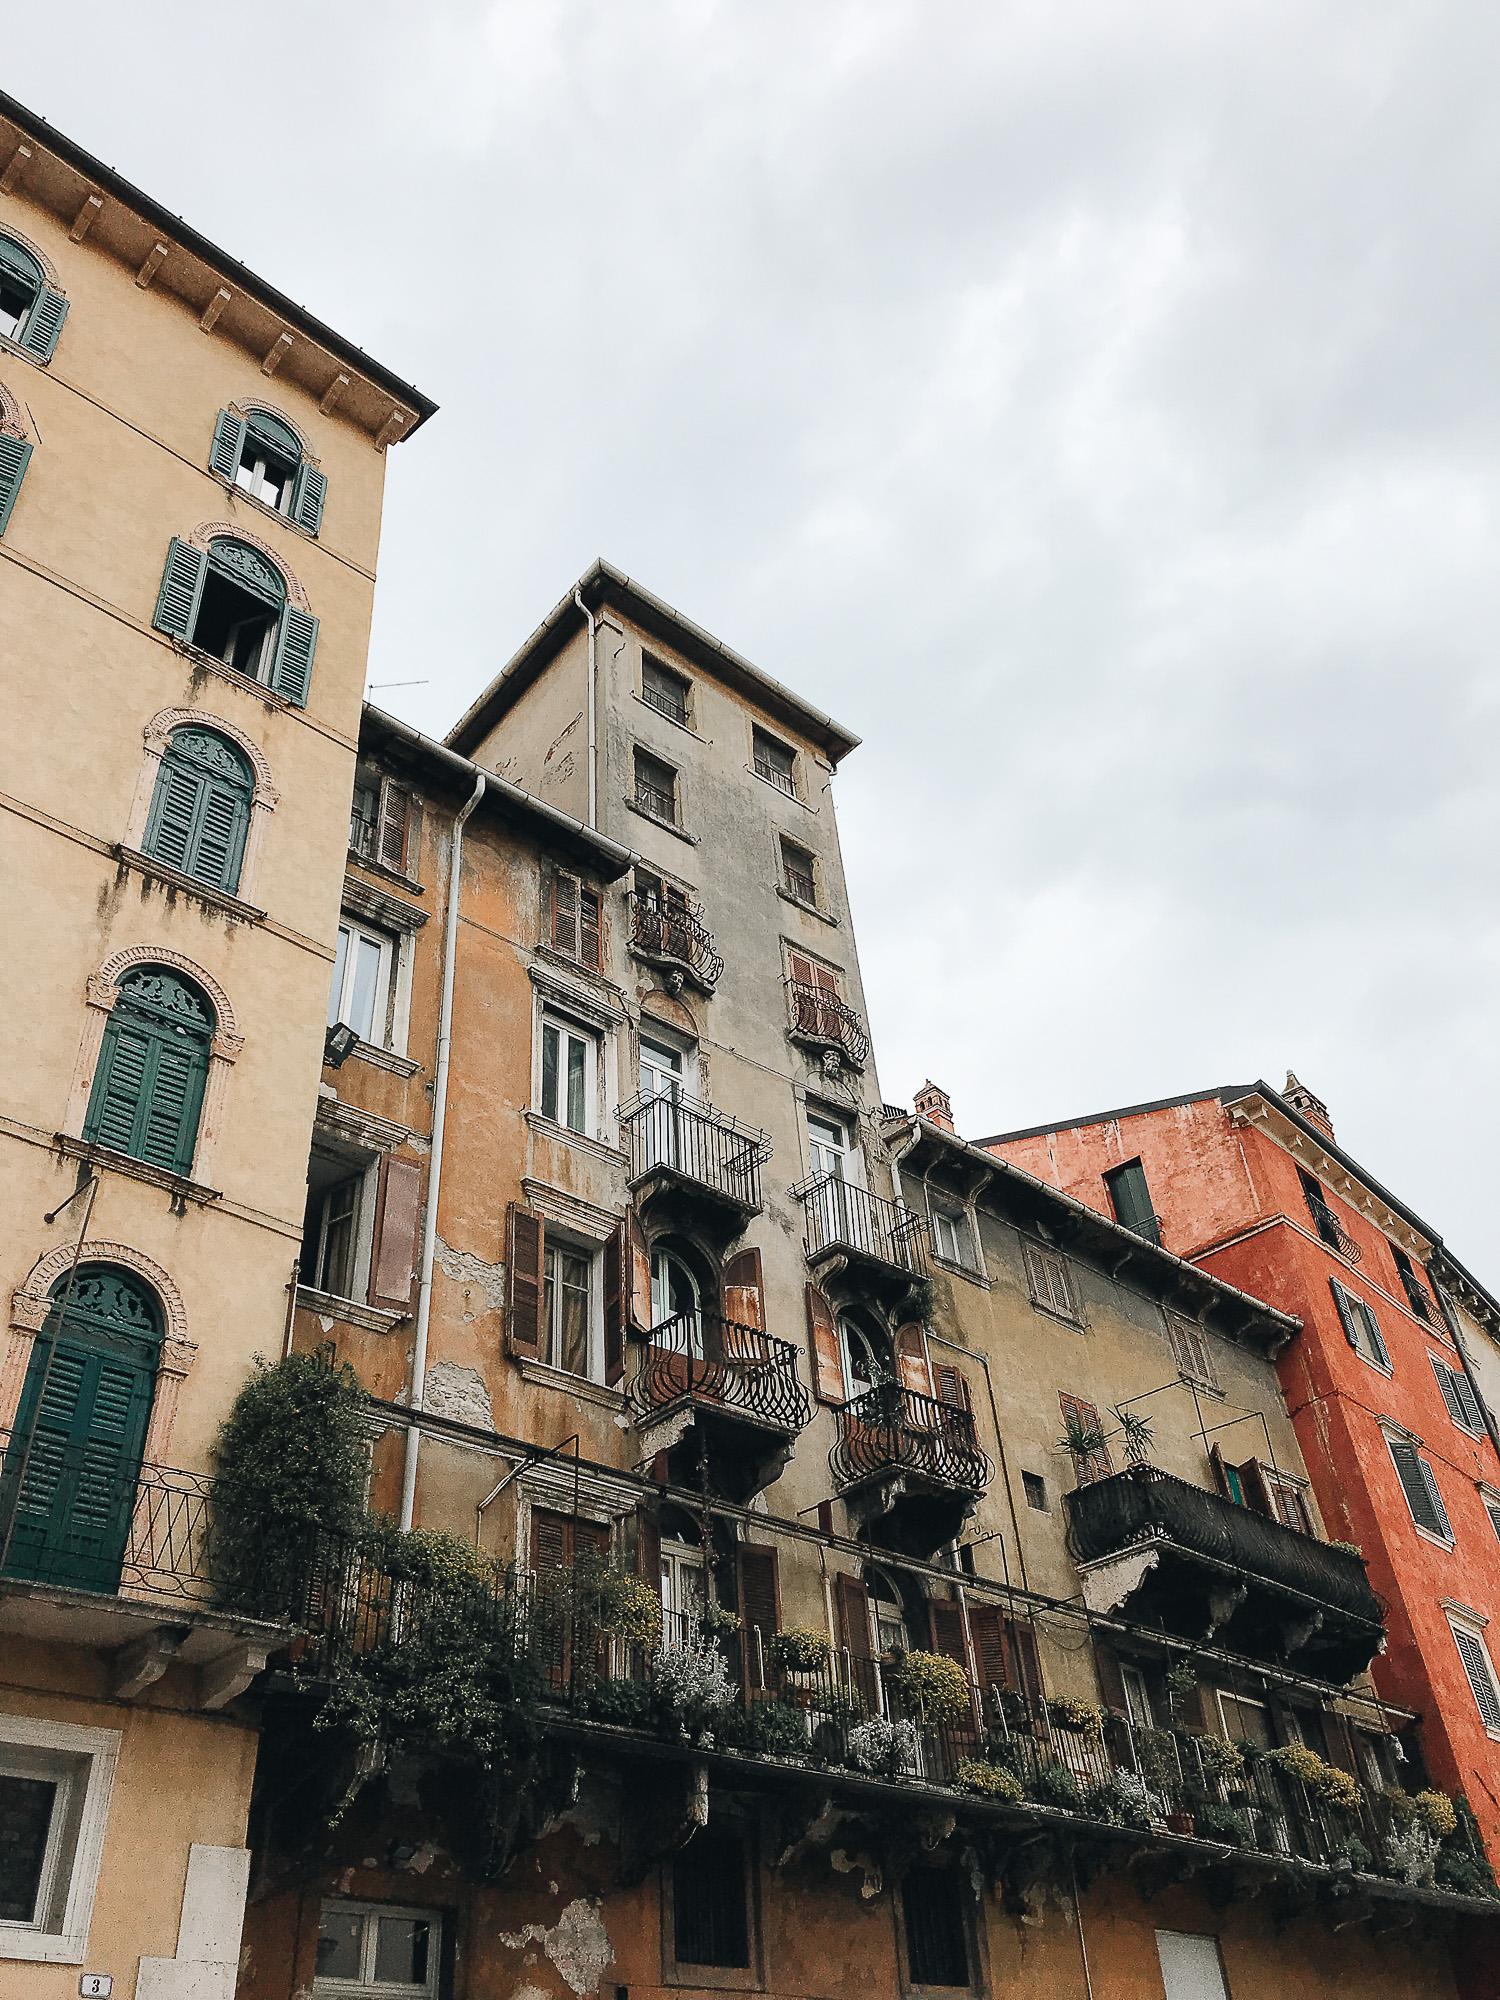 OurBeautifulAdventure-LakeGarda-Italy-Blog-6209.jpg